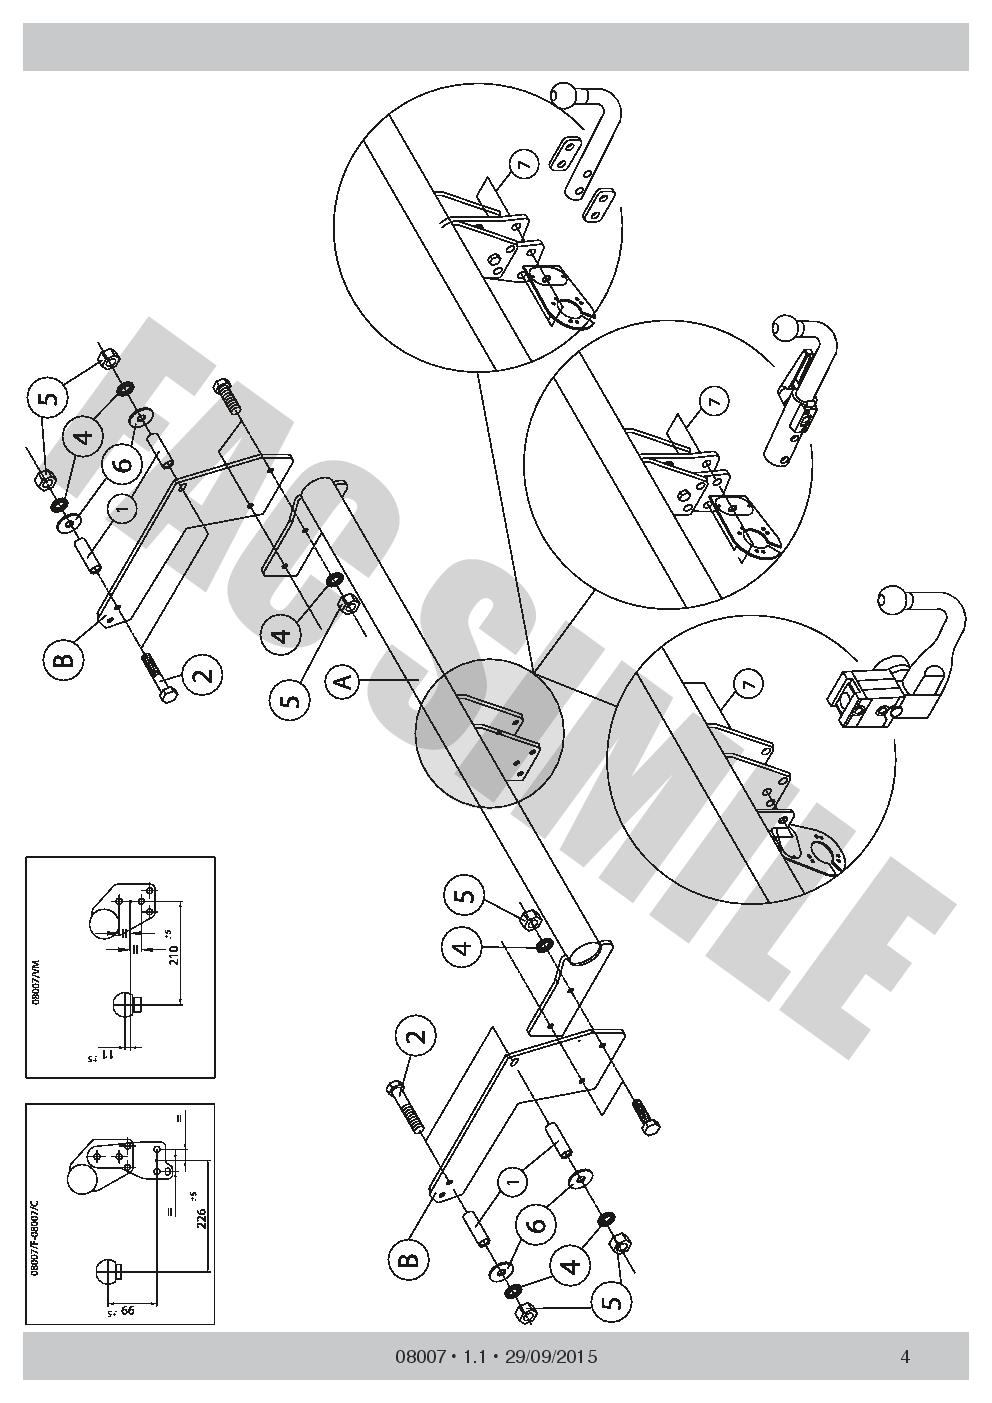 Detachable Towbar  13p C2    Wiring    Kit for    Dacia       Duster    SUV 2010 0800 H1   eBay